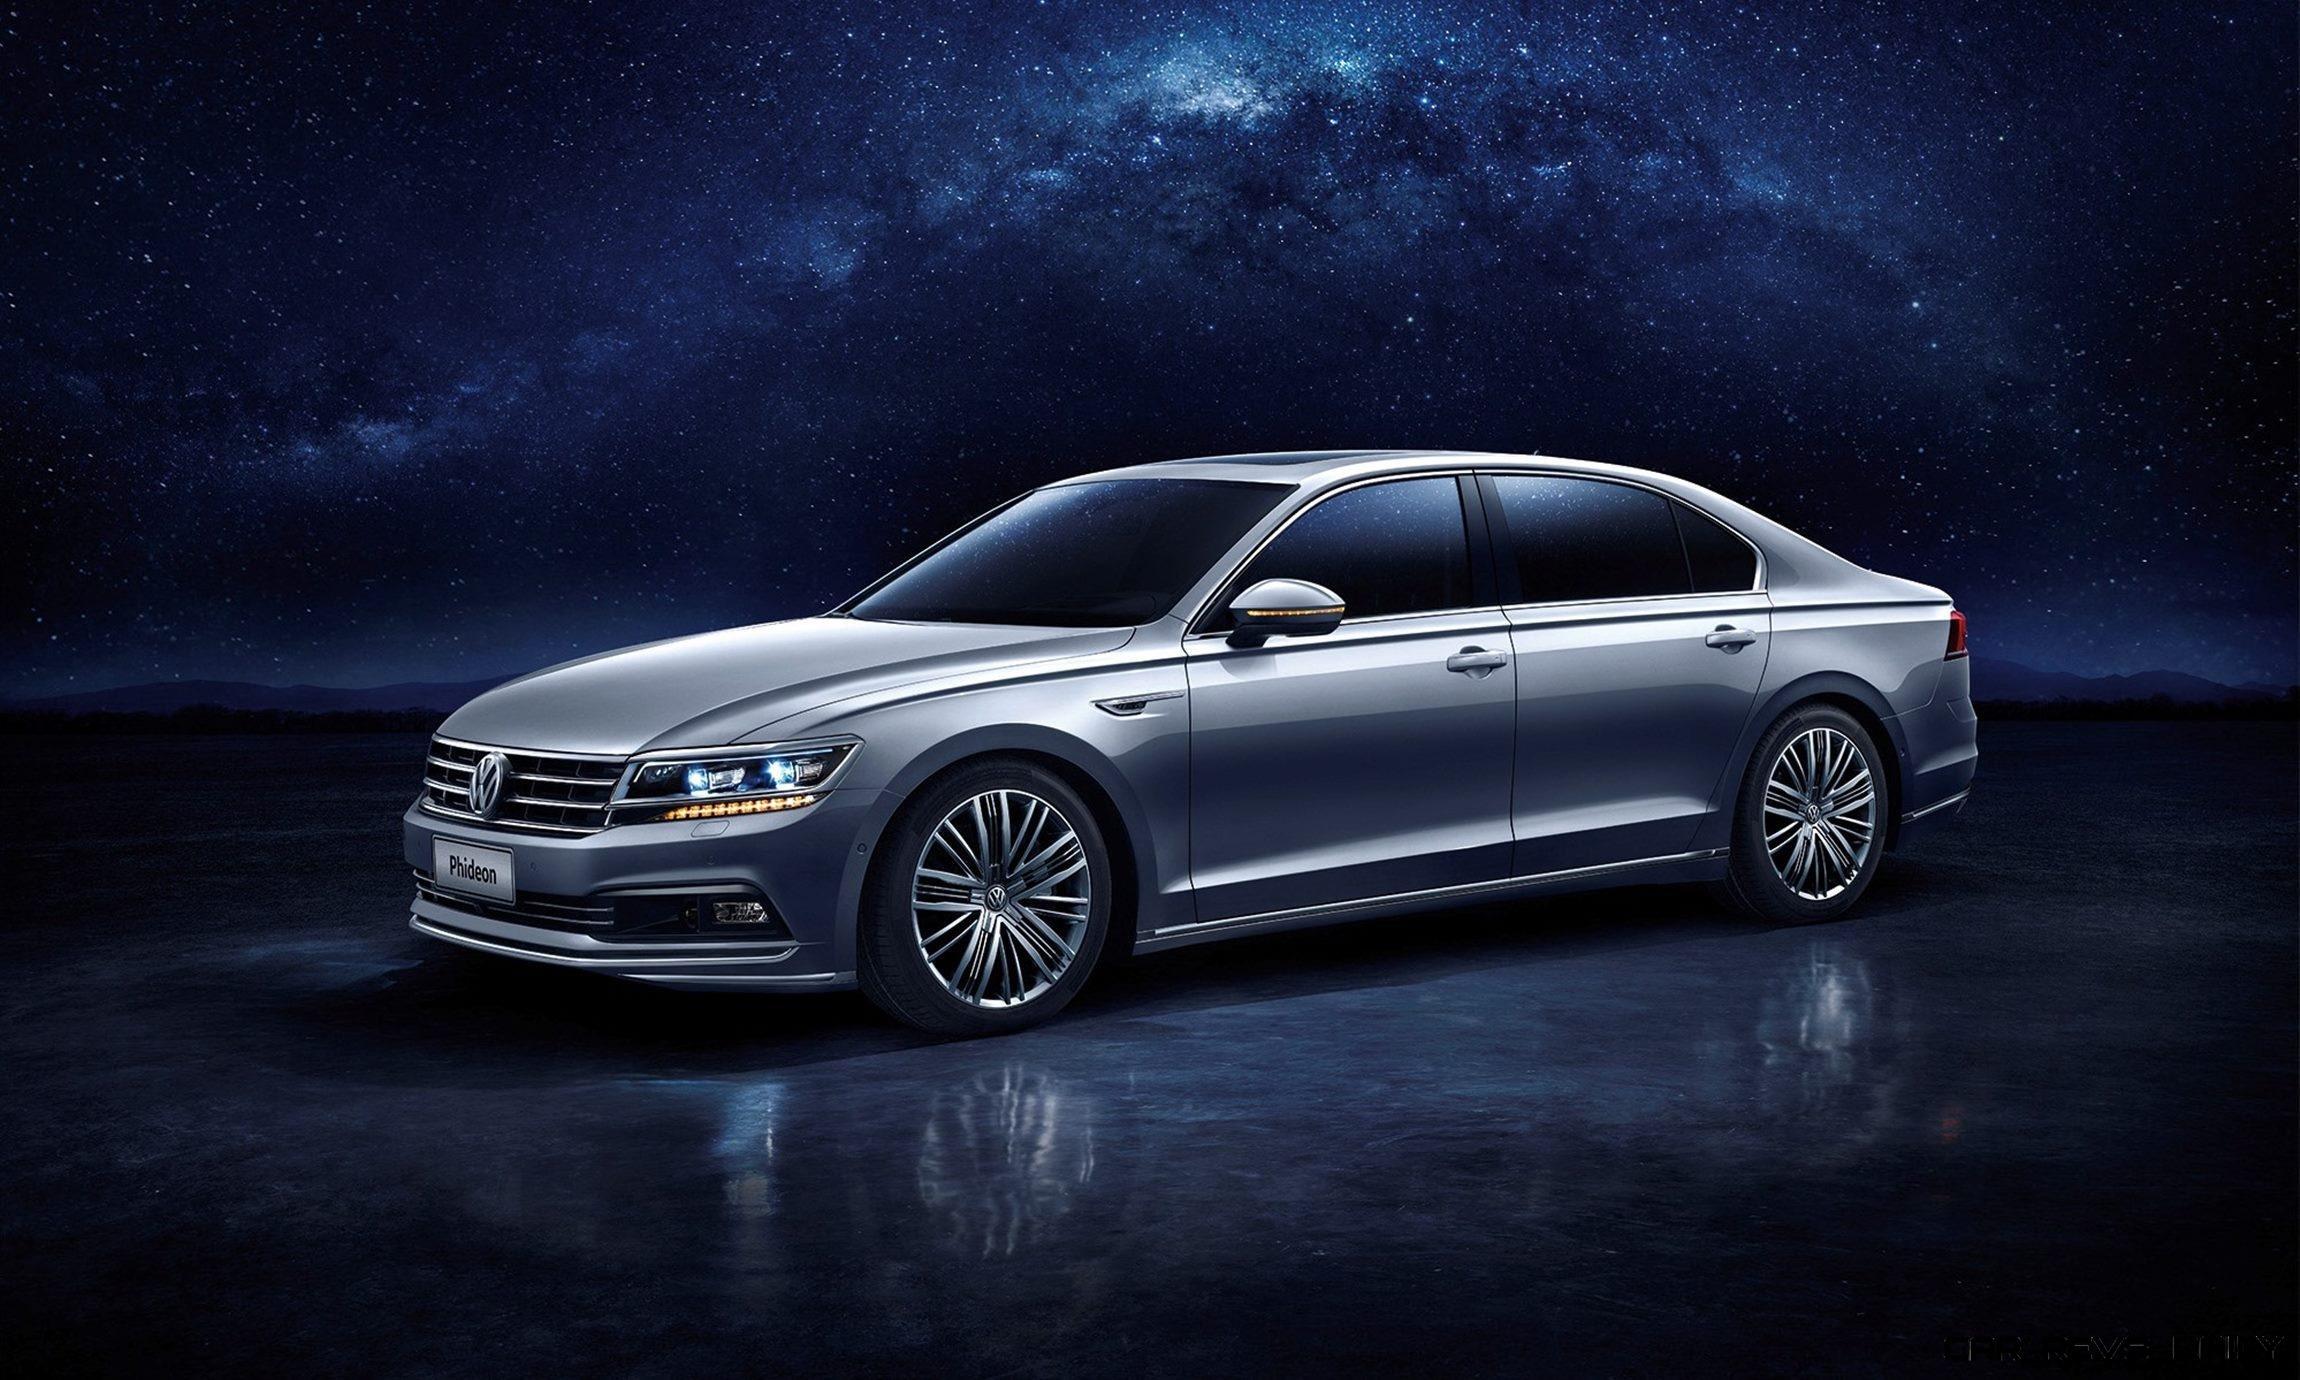 Geneva Debuts 2016 Saic Volkswagen Phideon China Only